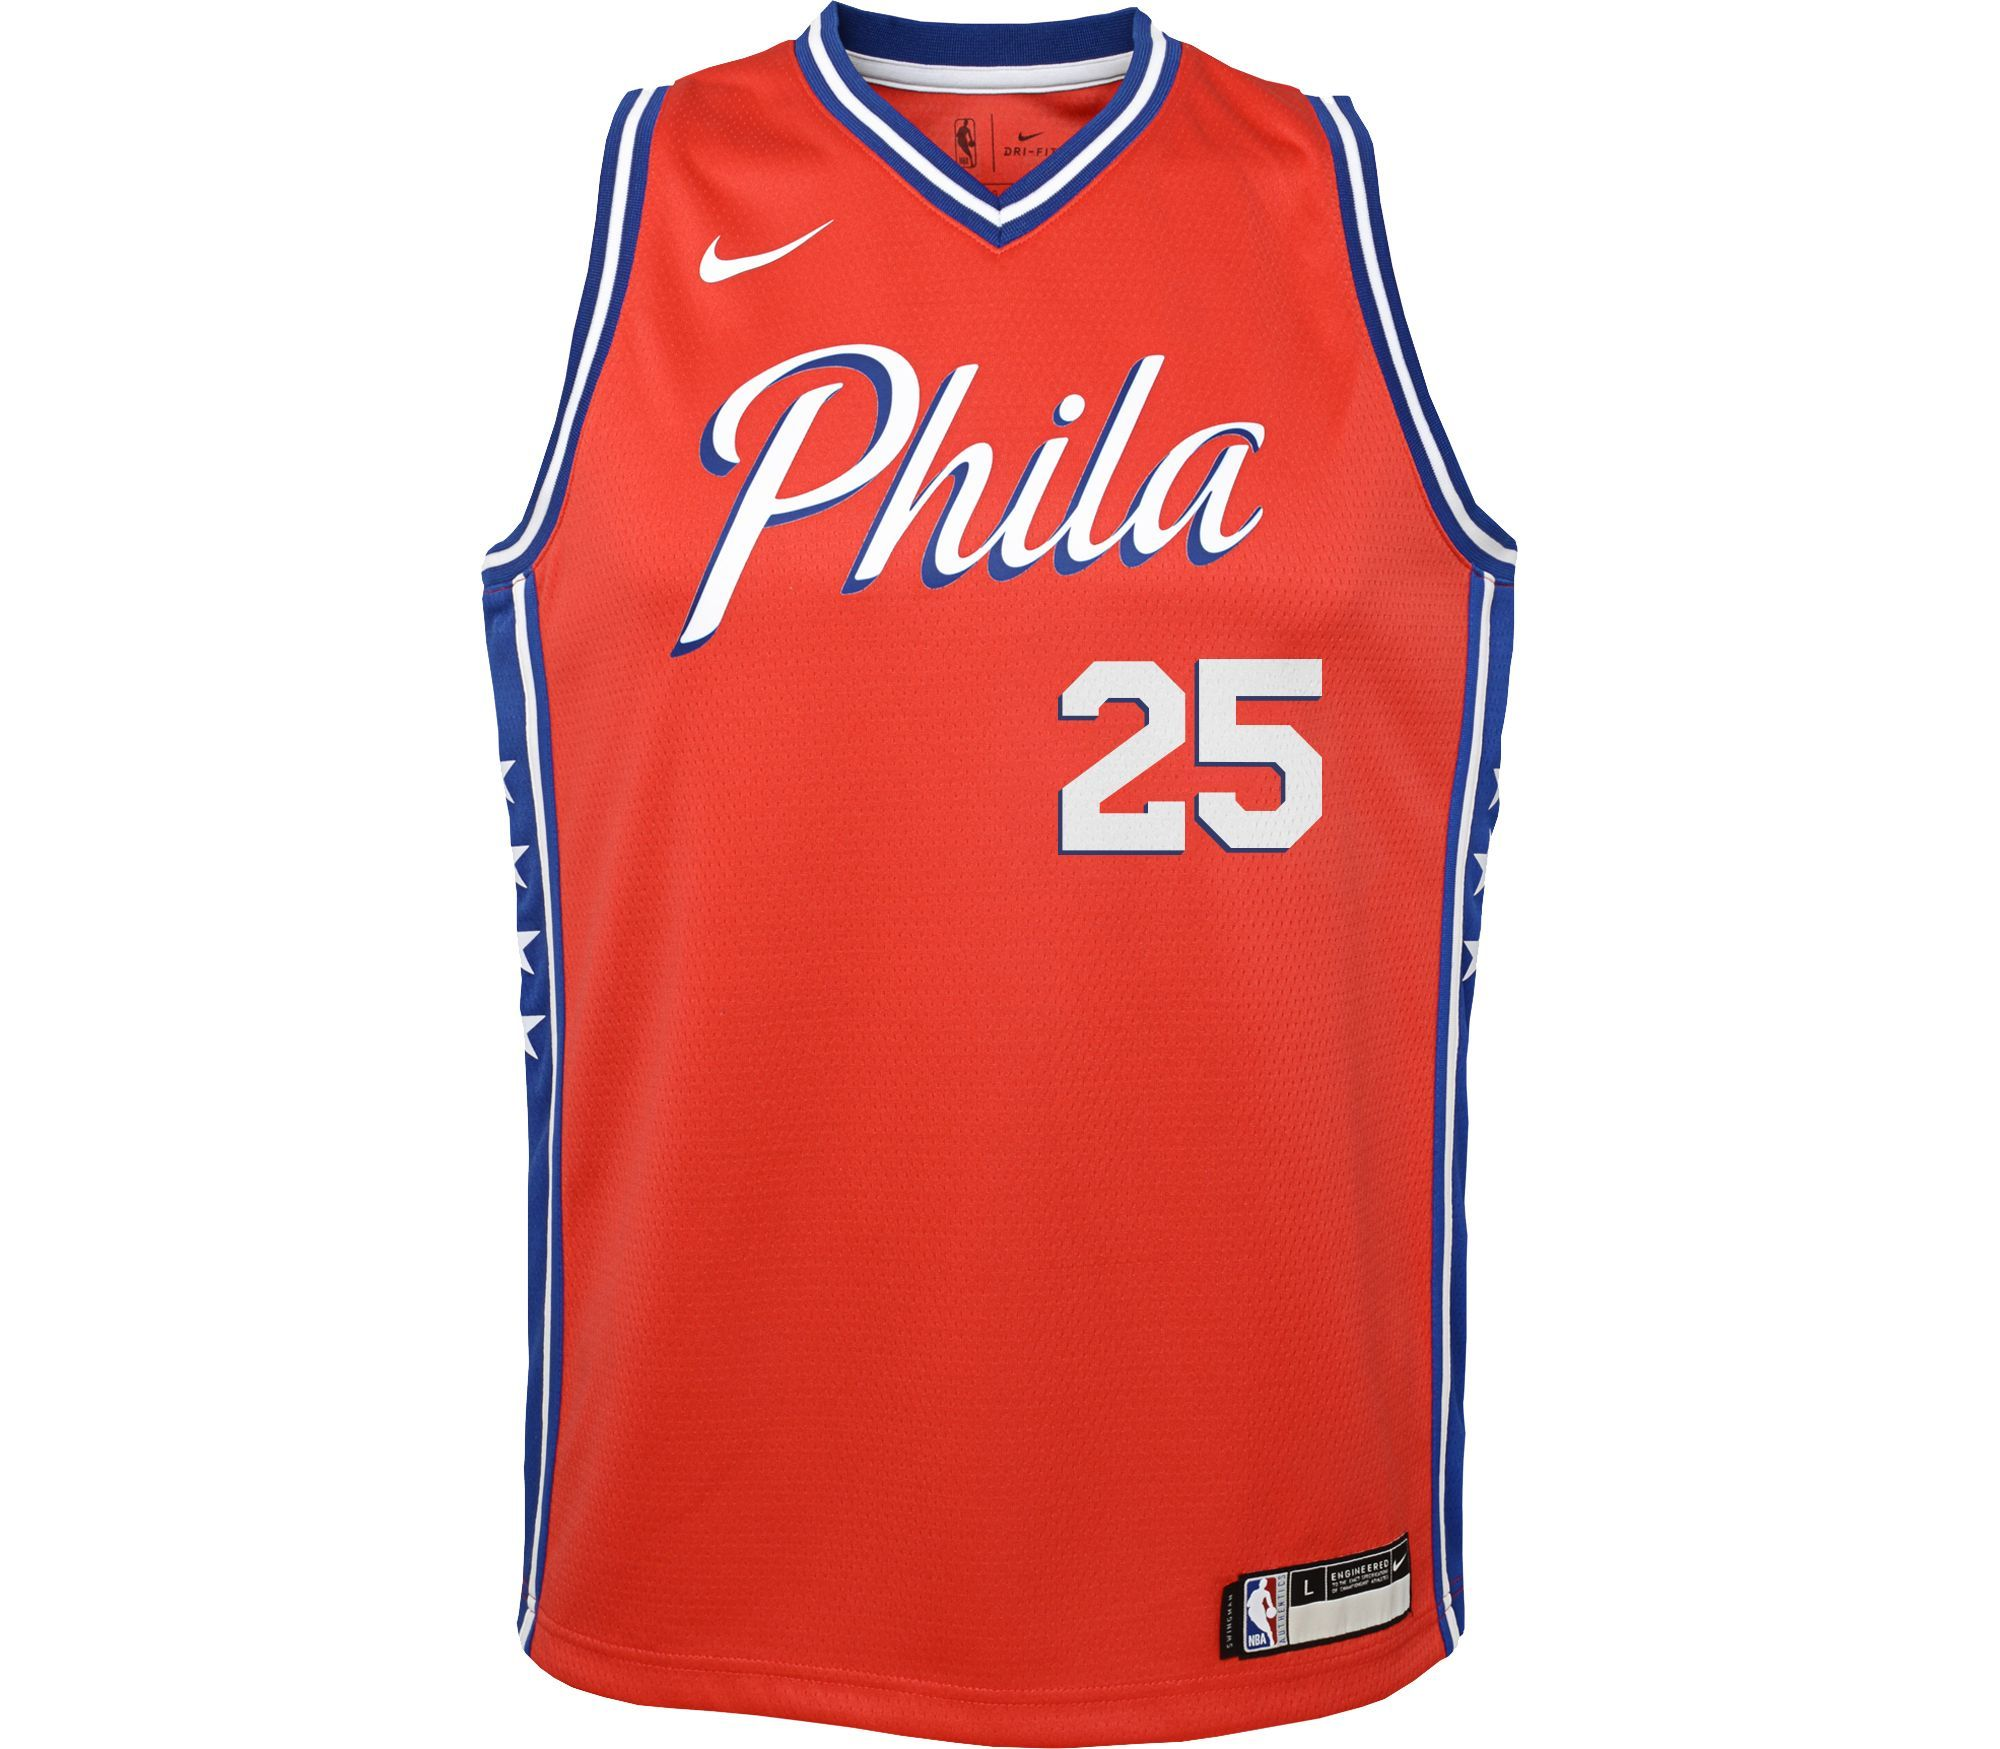 best cheap nba jerseys reddit Nike Ben Simmons Philadelphia 76ers ...